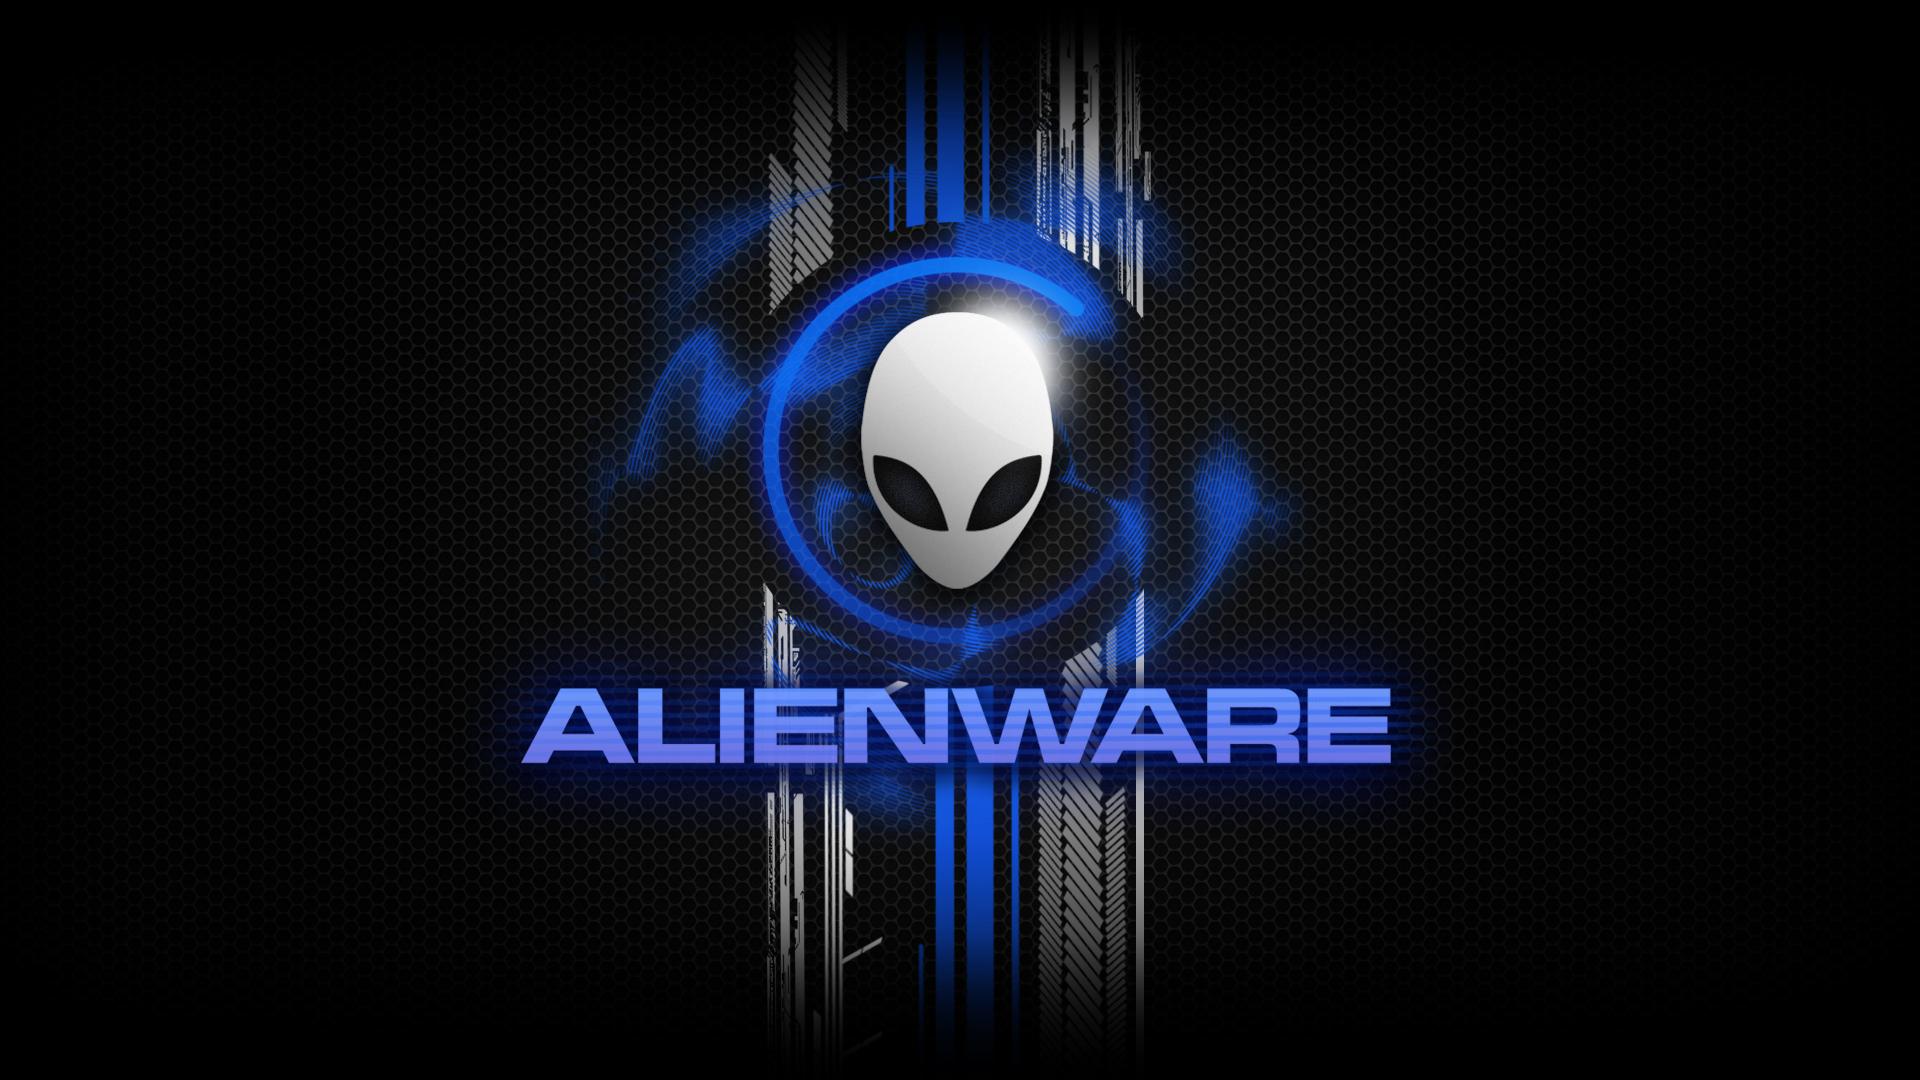 alienware 1920x1080px 991 76 kb alienware 1600x1000px 107 76 kb 1920x1080